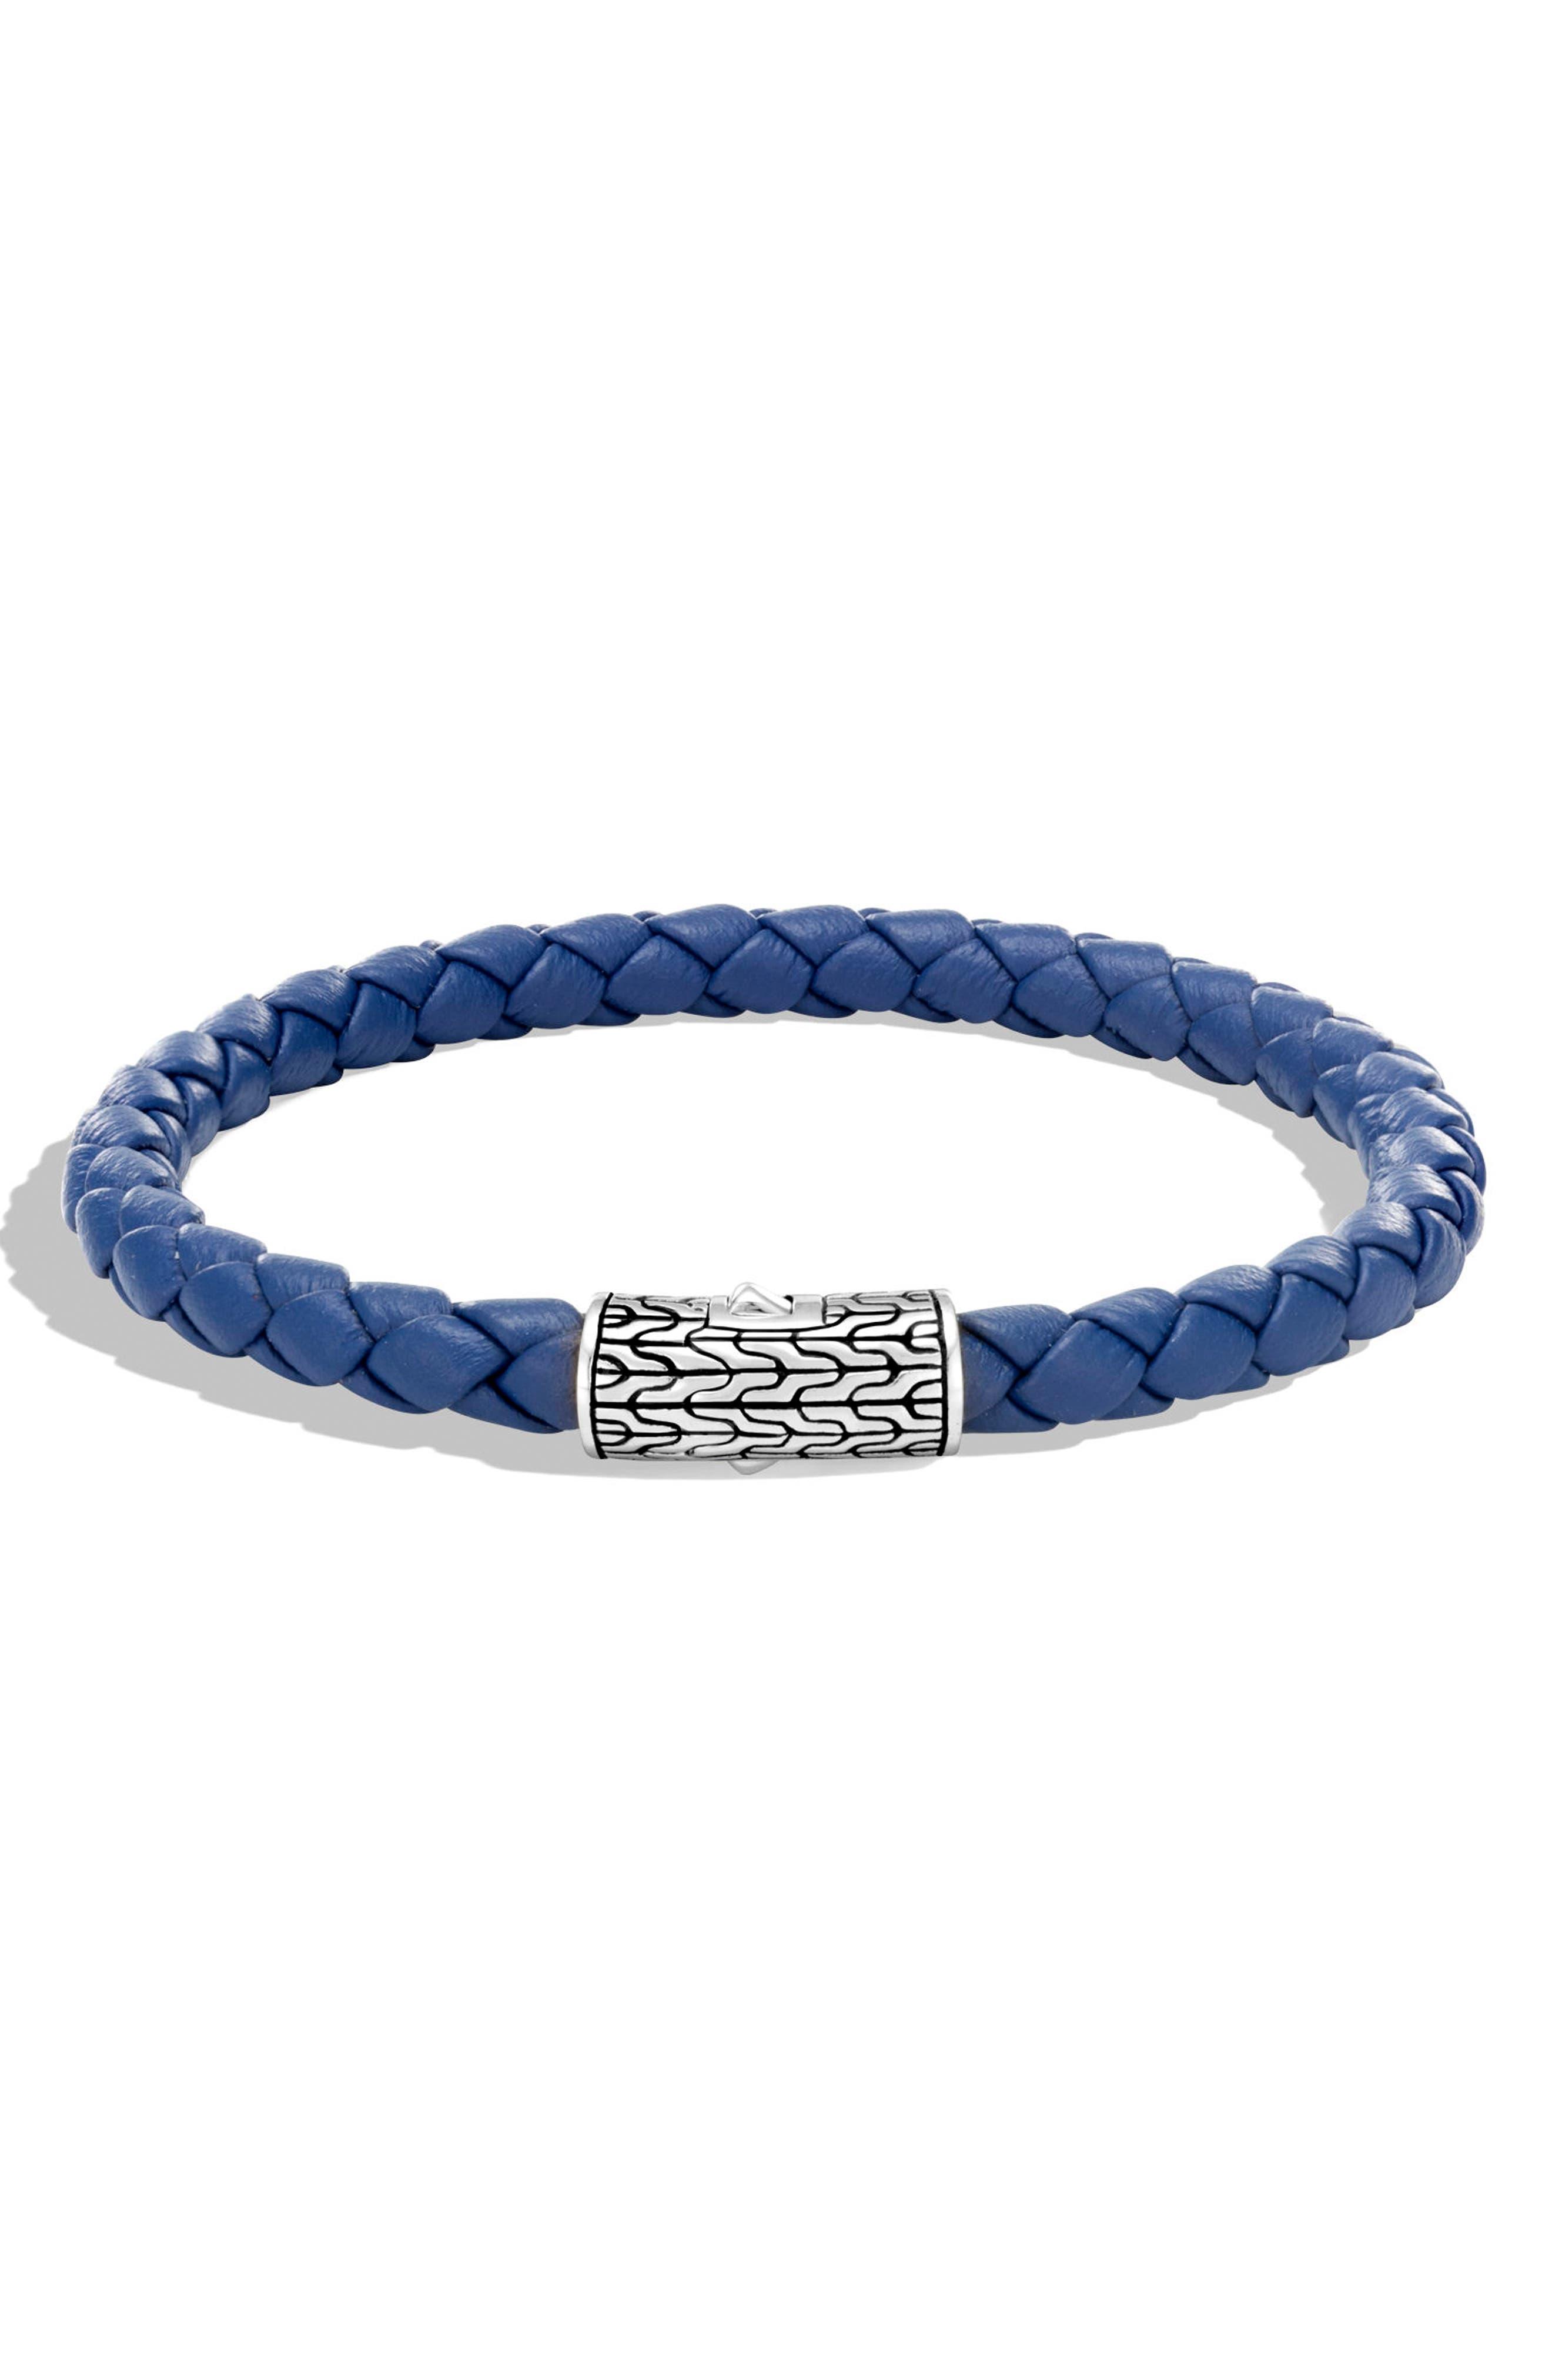 Classic Chain Leather Station Bracelet,                         Main,                         color, LIGHT BLUE LEATHER